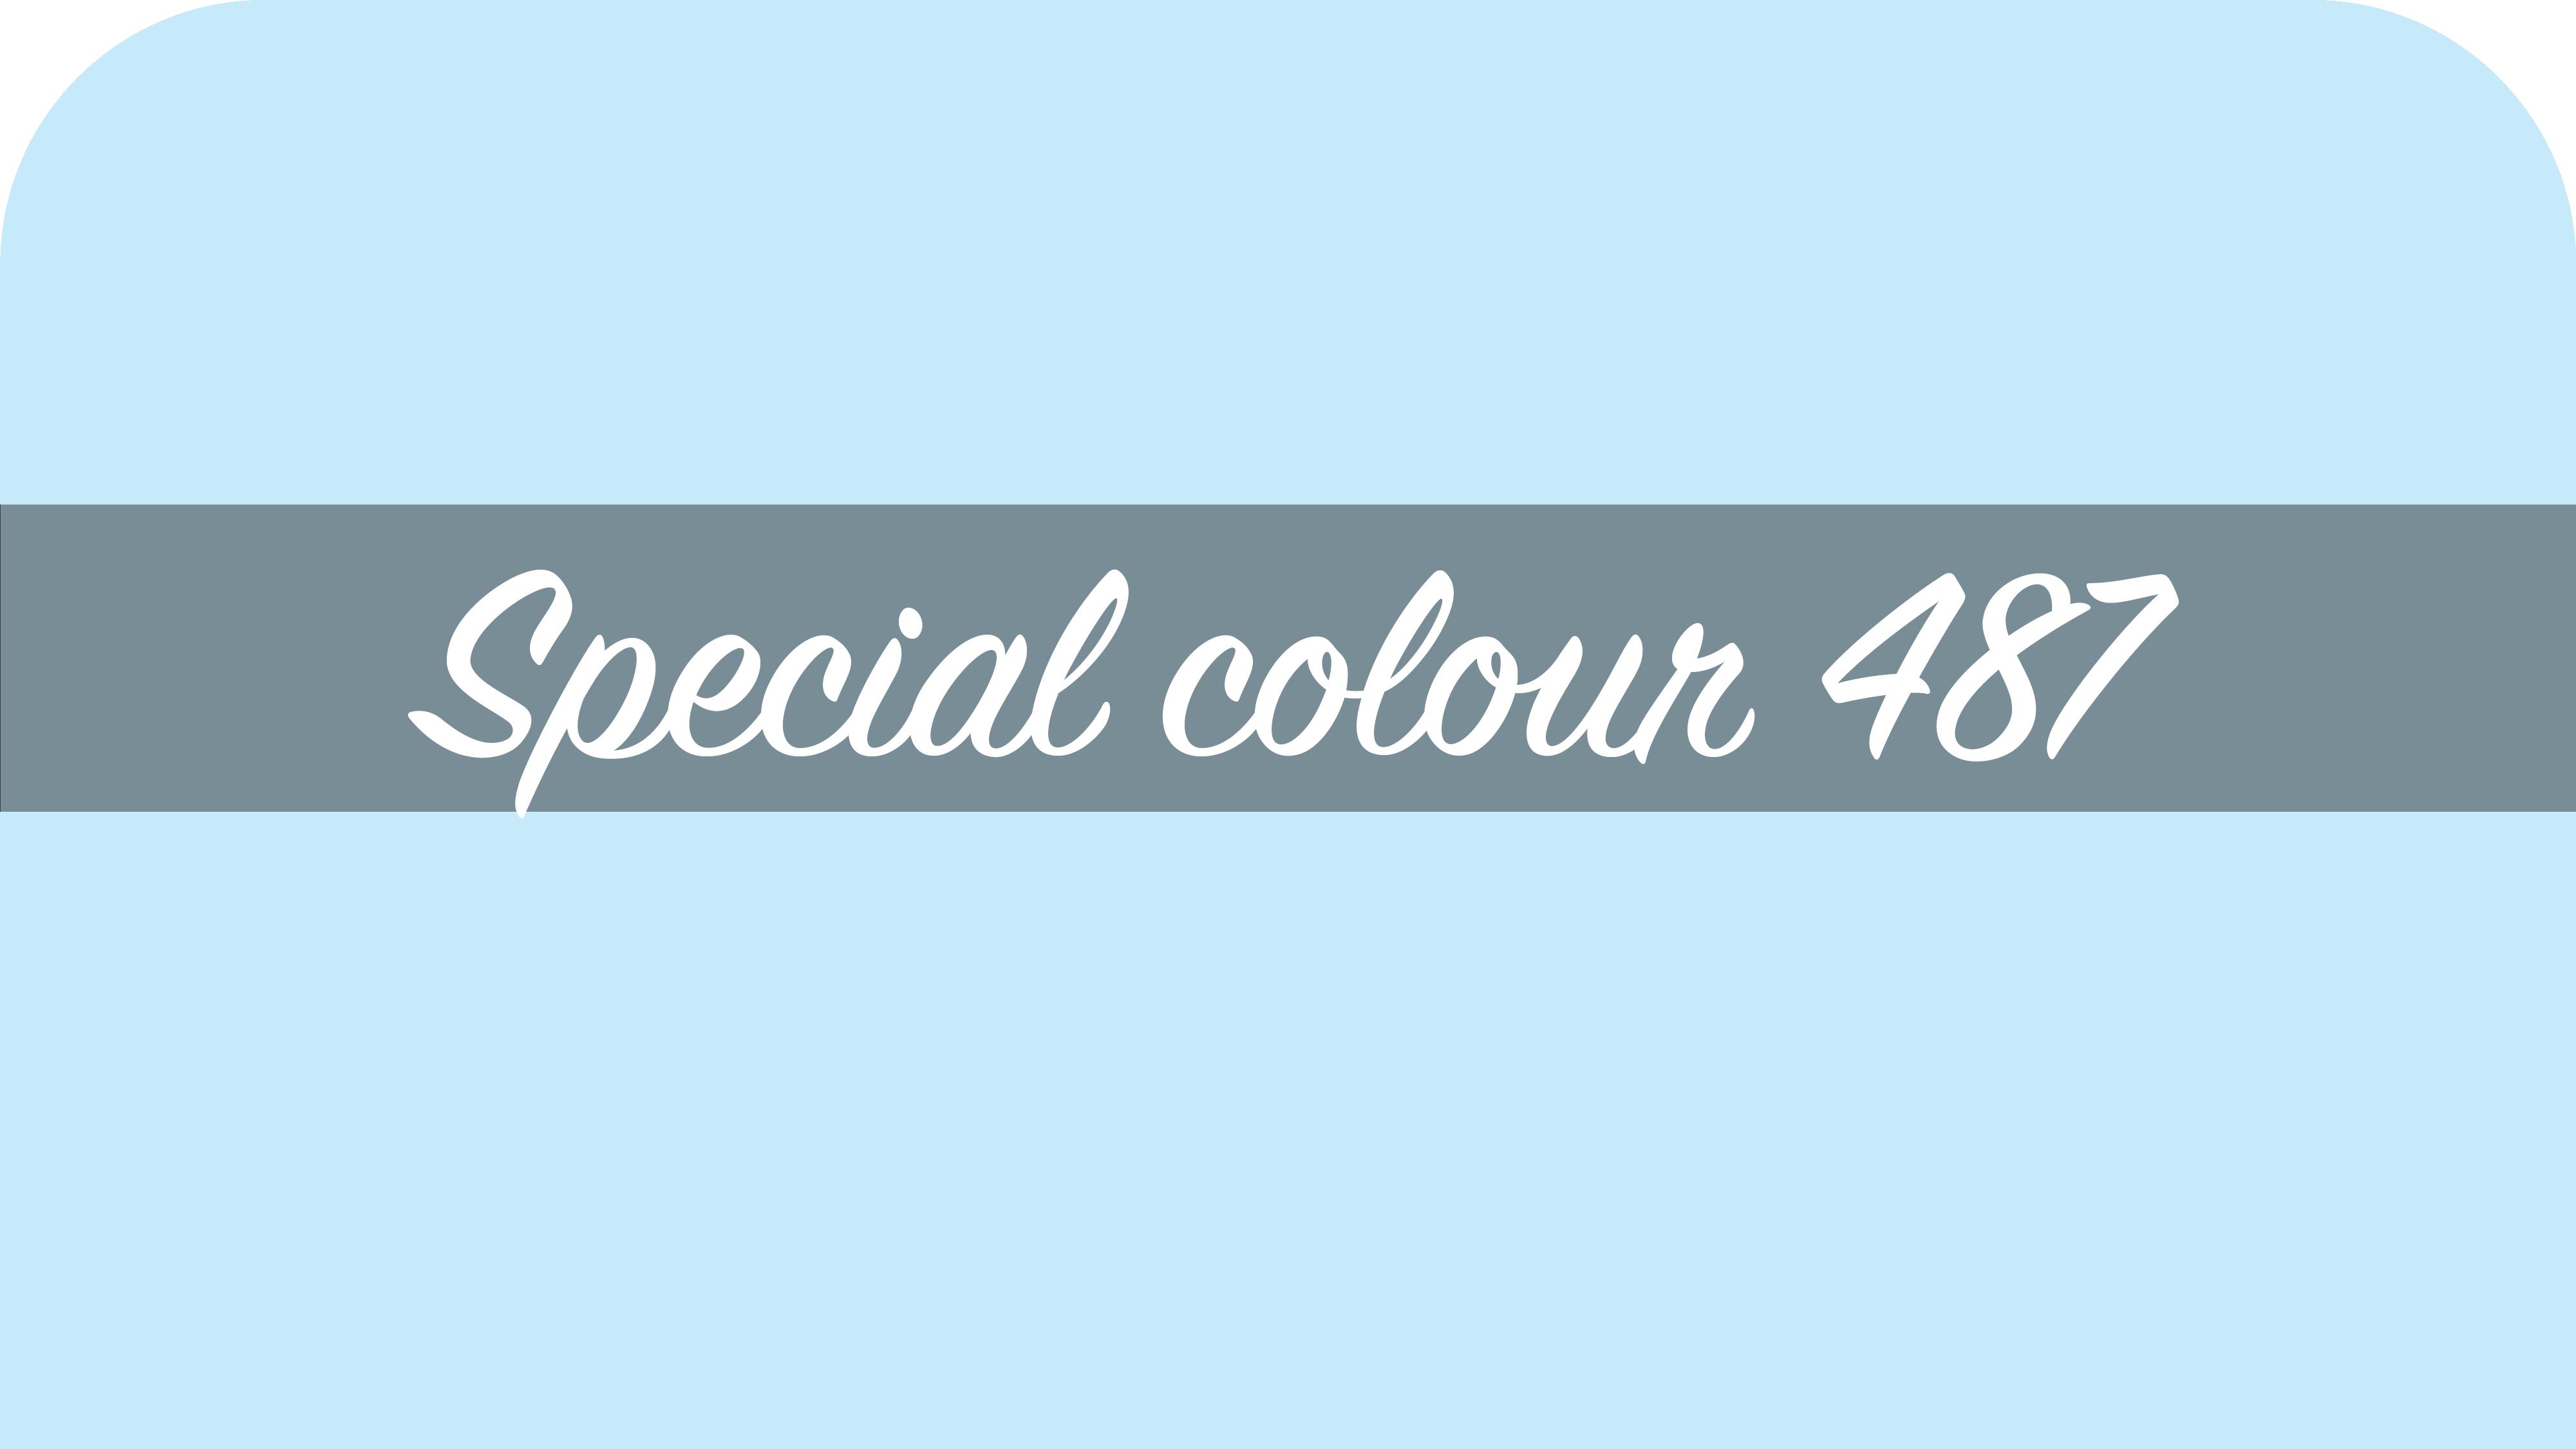 special-colour-487